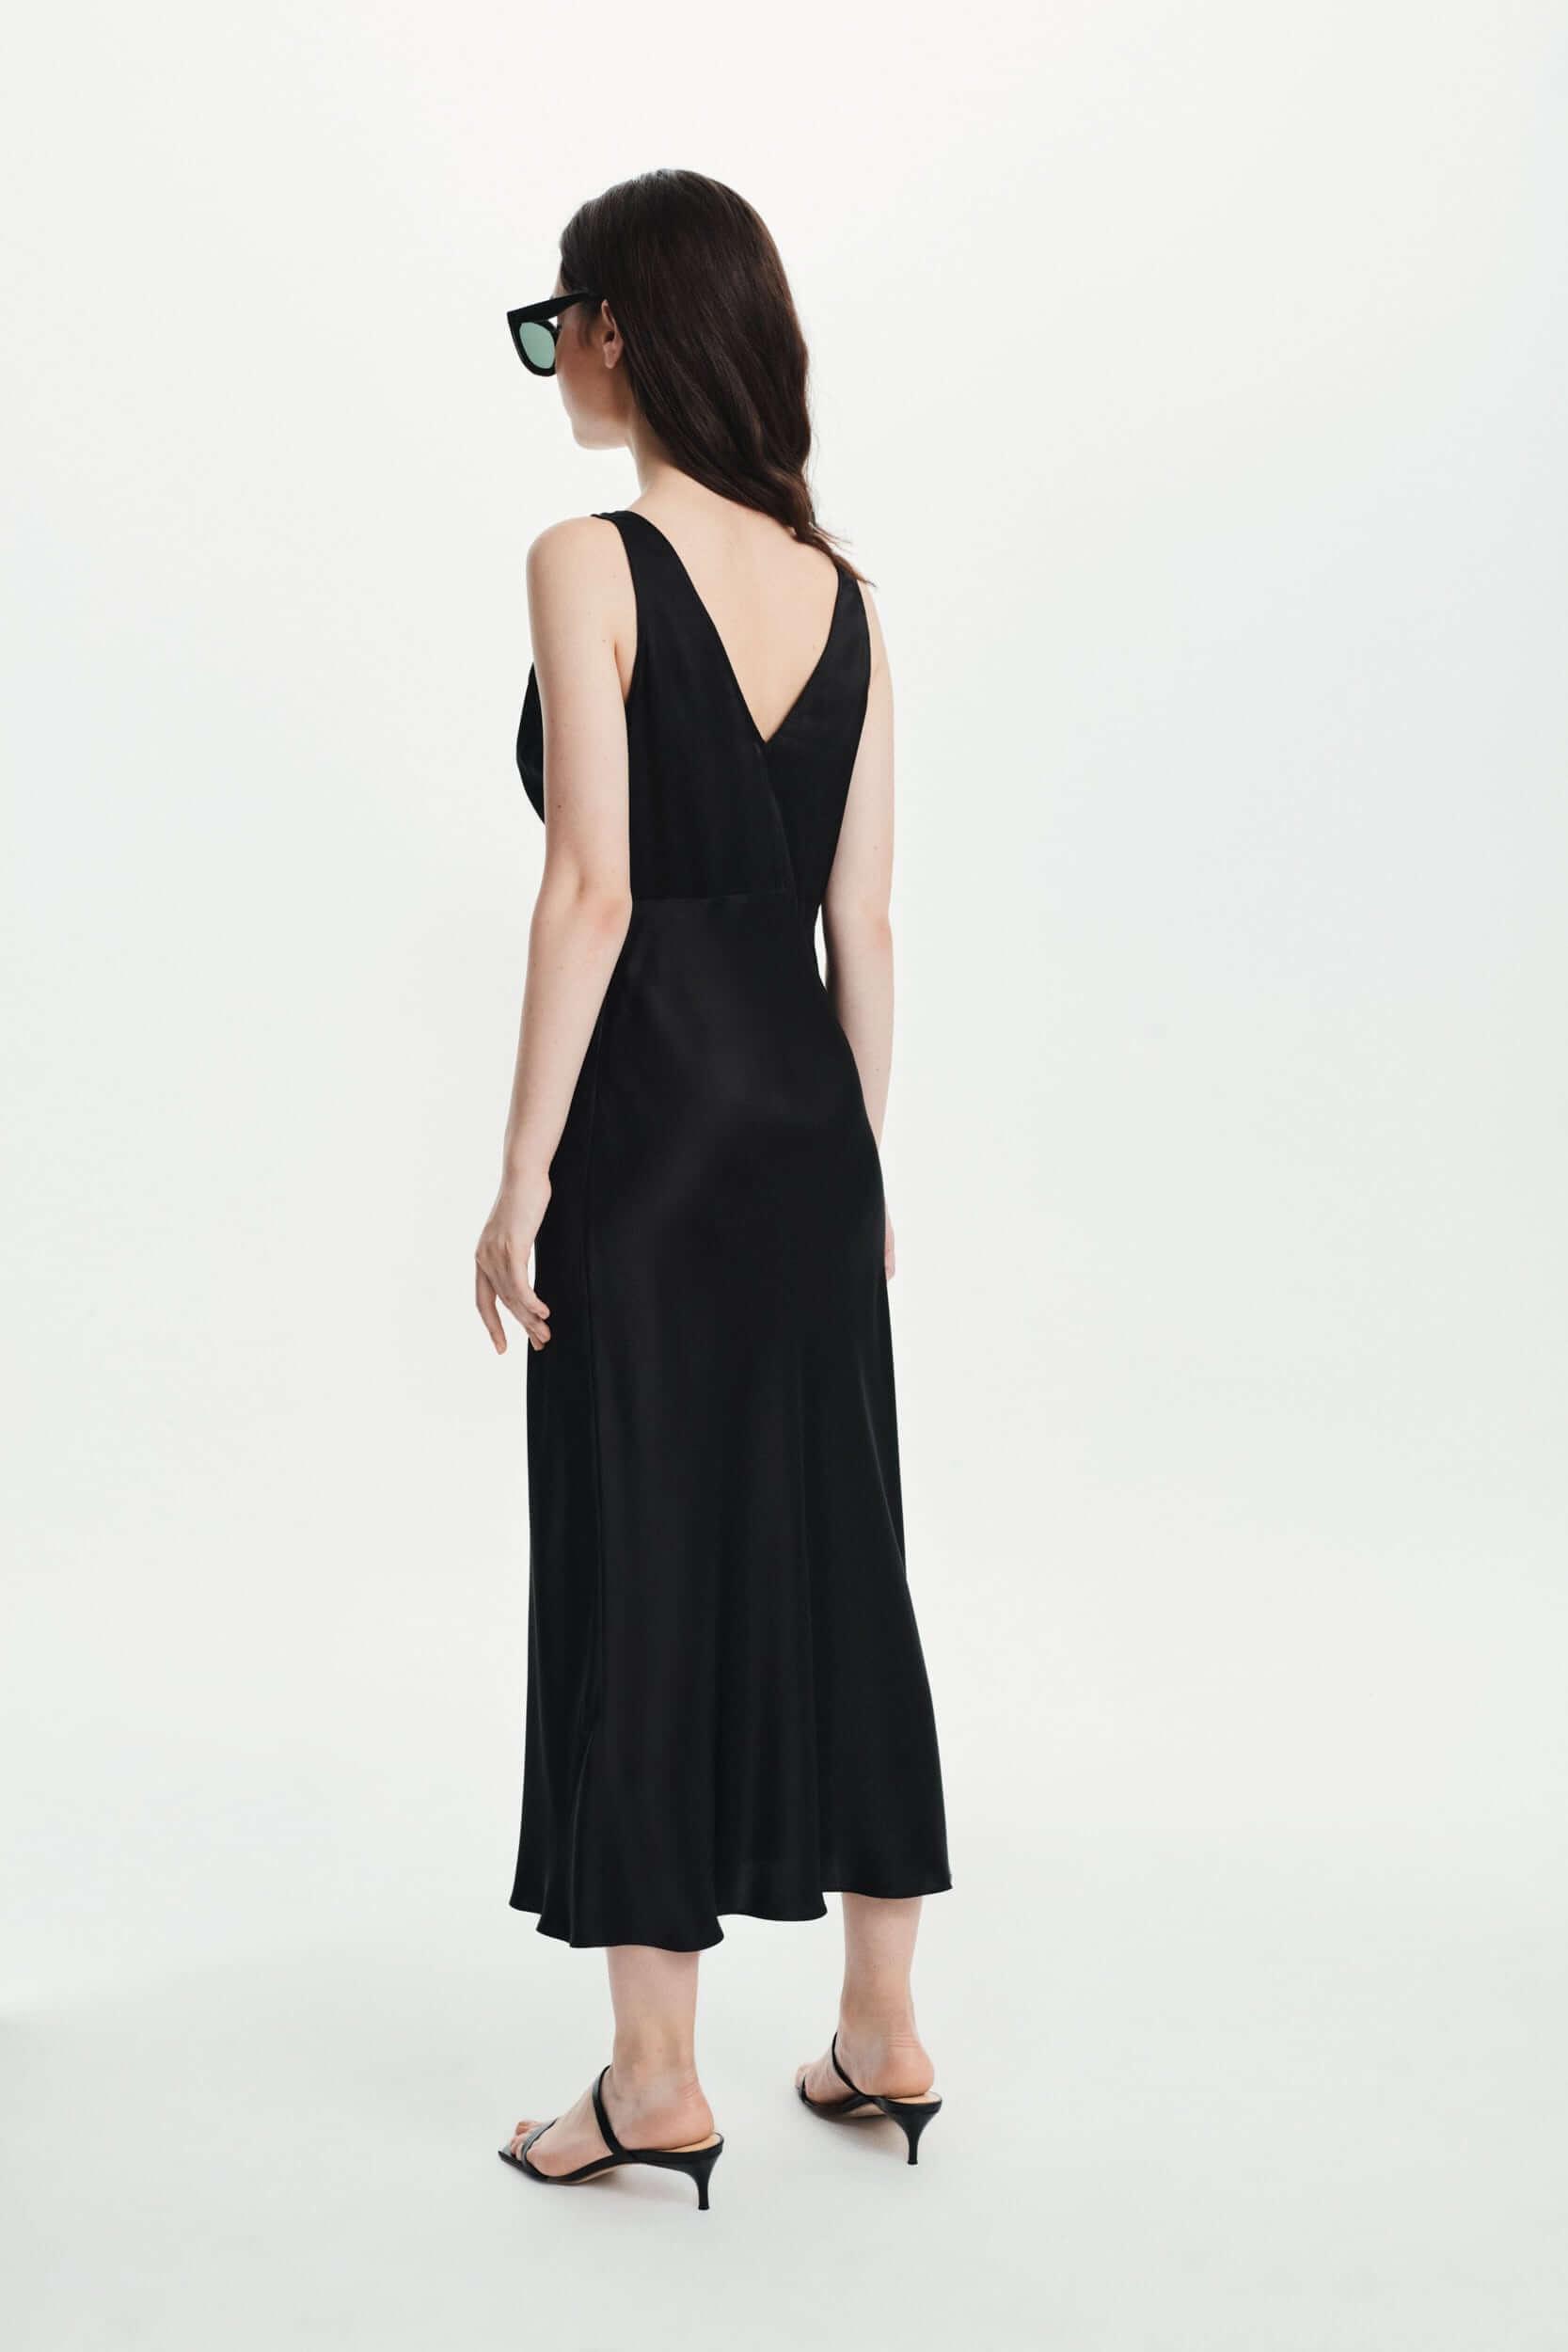 Silk Midi Dress in black